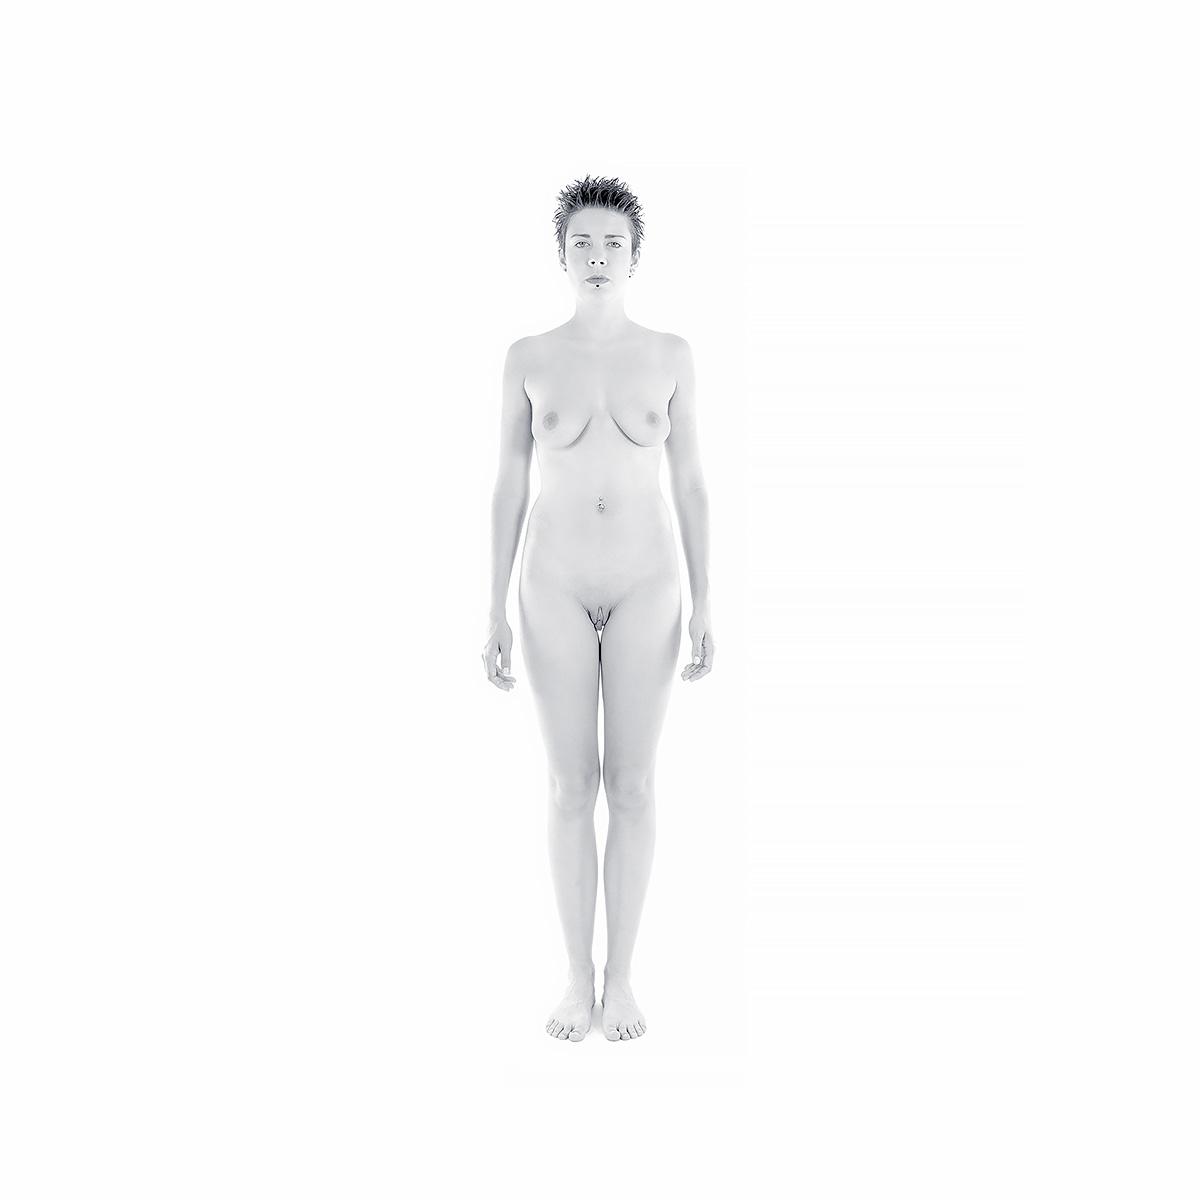 2018 The last HomoSapiens Bodies 010 tty art 1200 - 2018 - The last HomoSapiens. Bodies